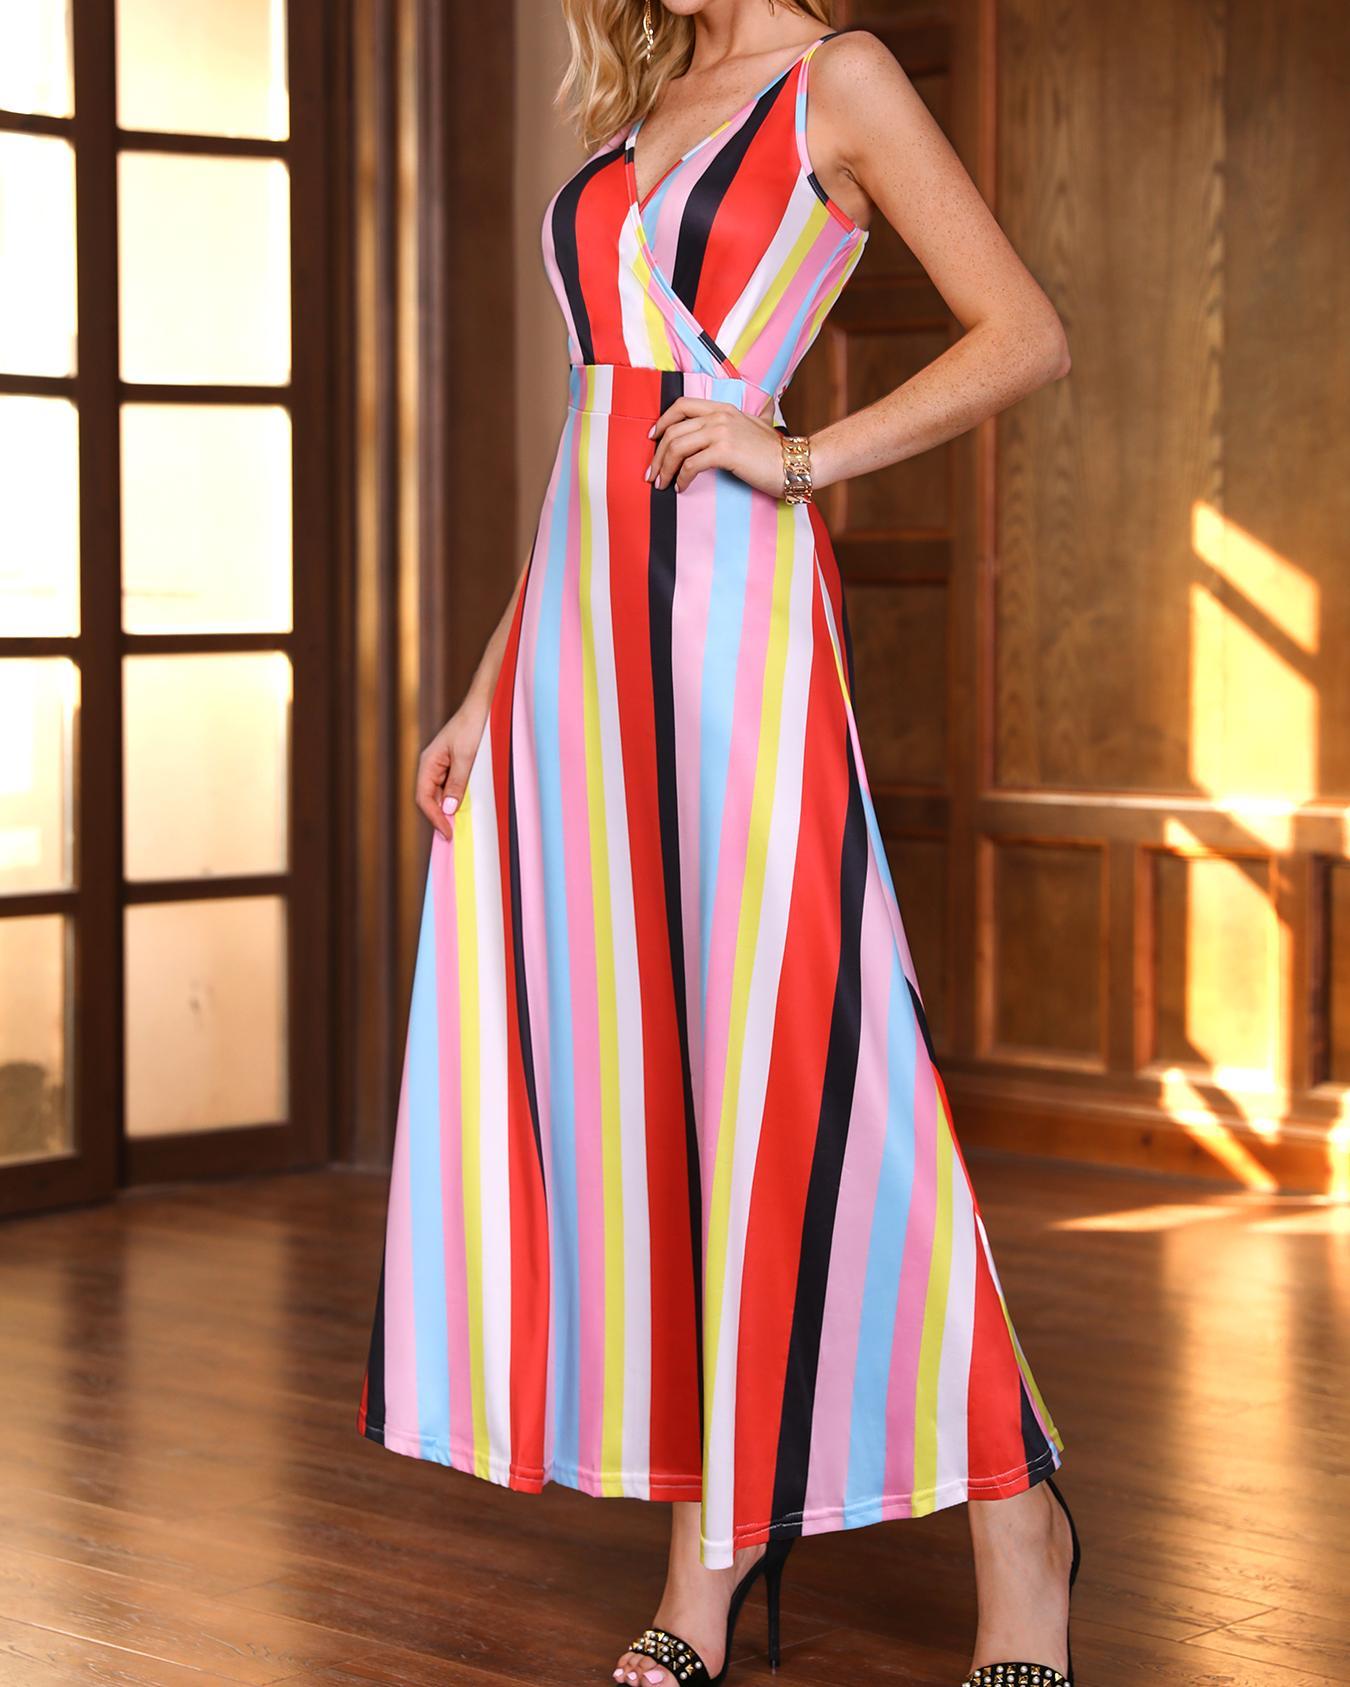 joyshoetique / Multicolored Spaghetti Strap Striped Maxi Dress